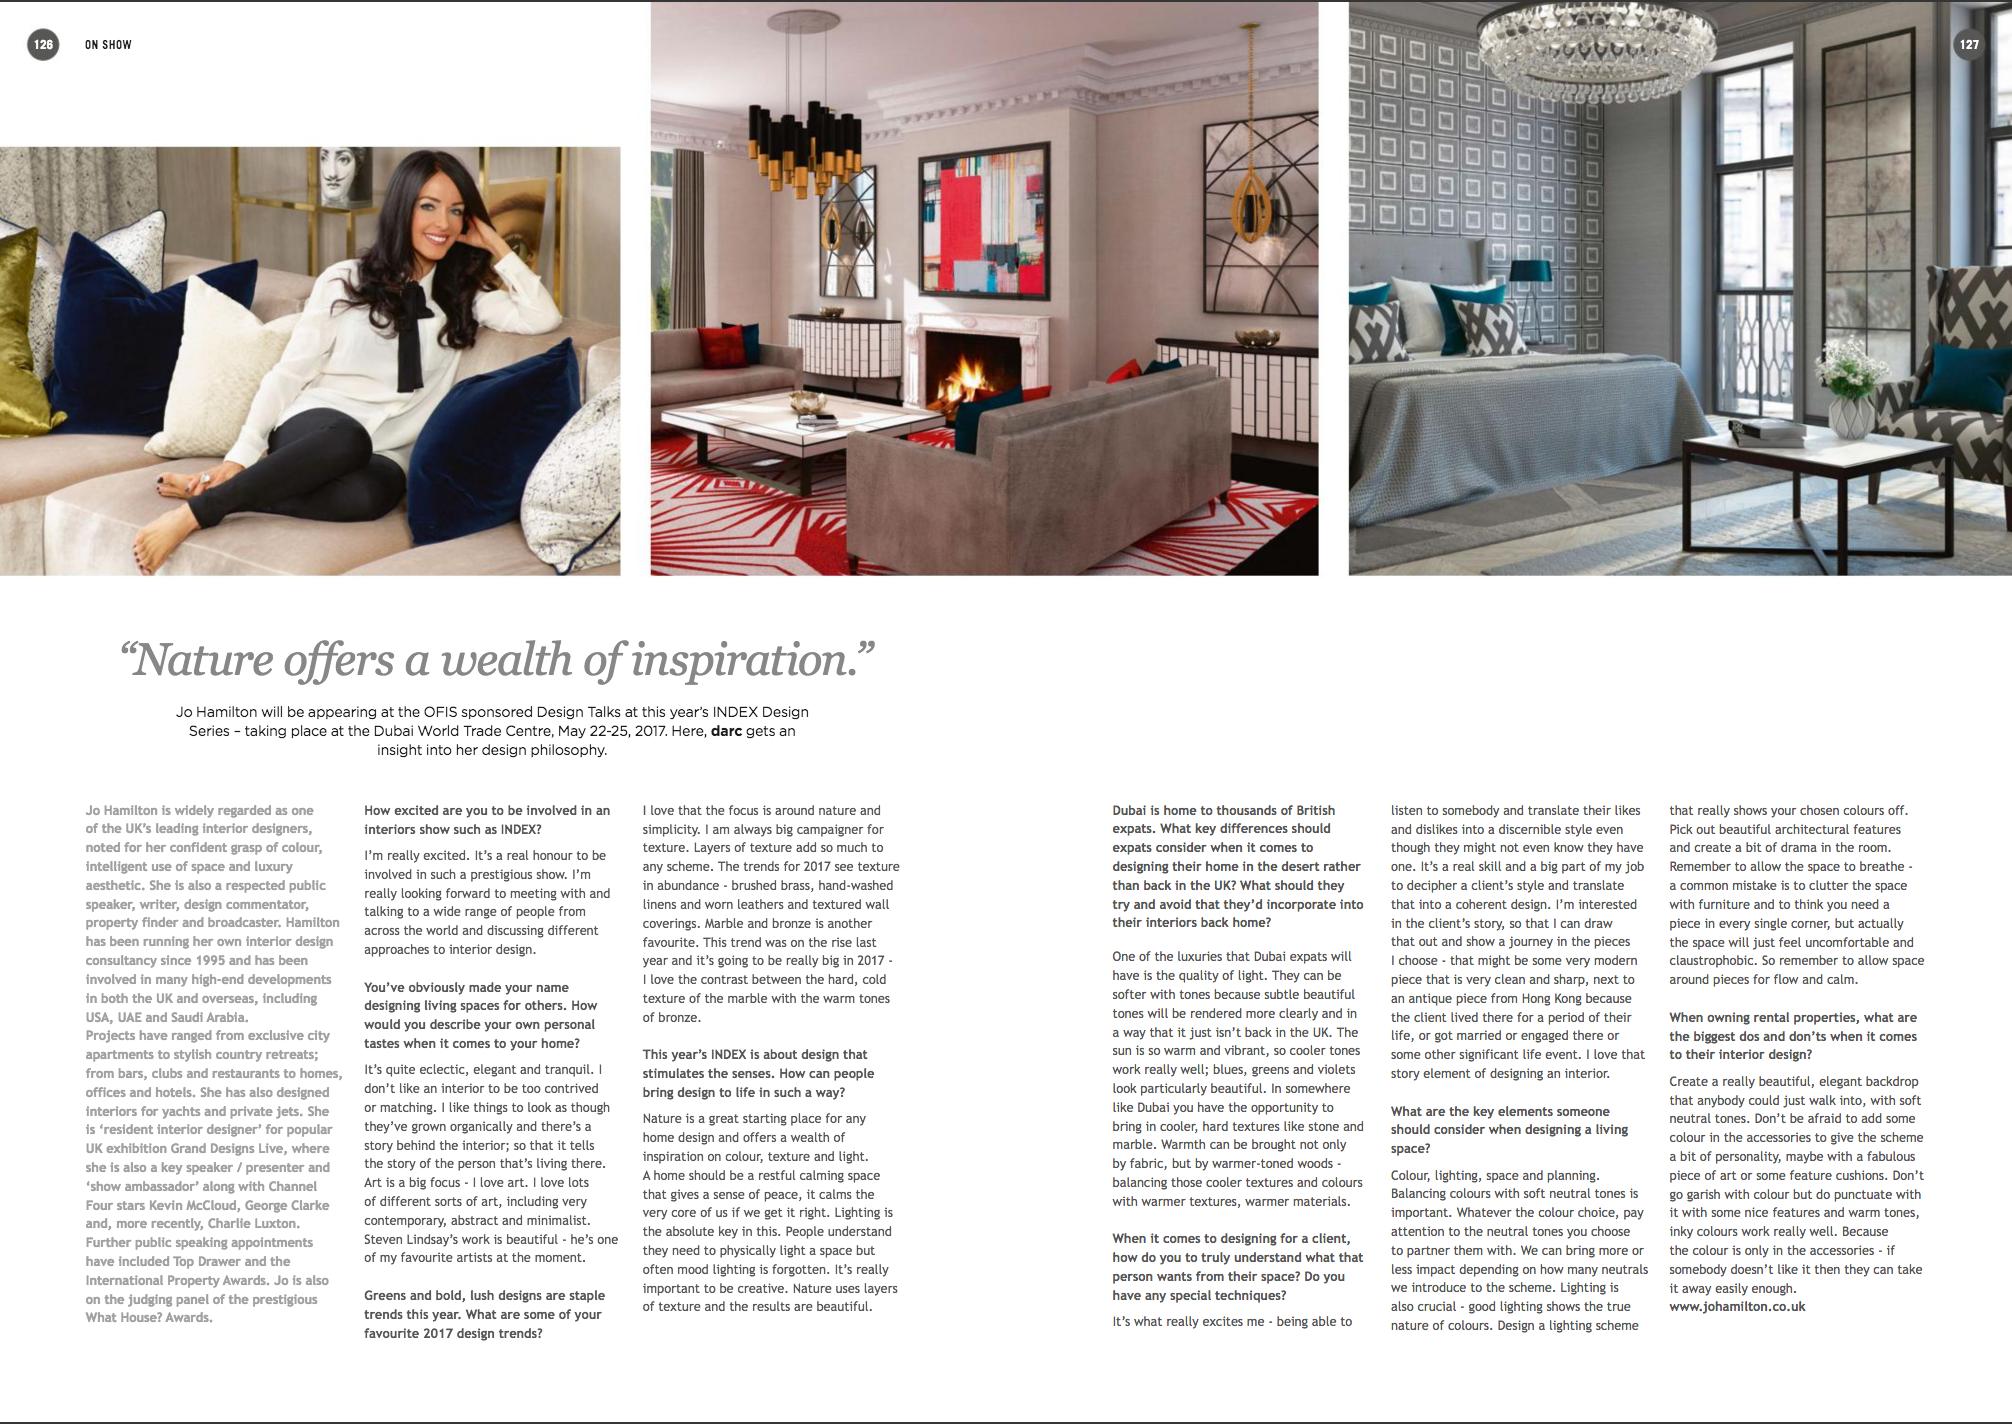 Luxury interior designer Jo Hamilton interview with Darc magazine ahead of Index Dubai 2017